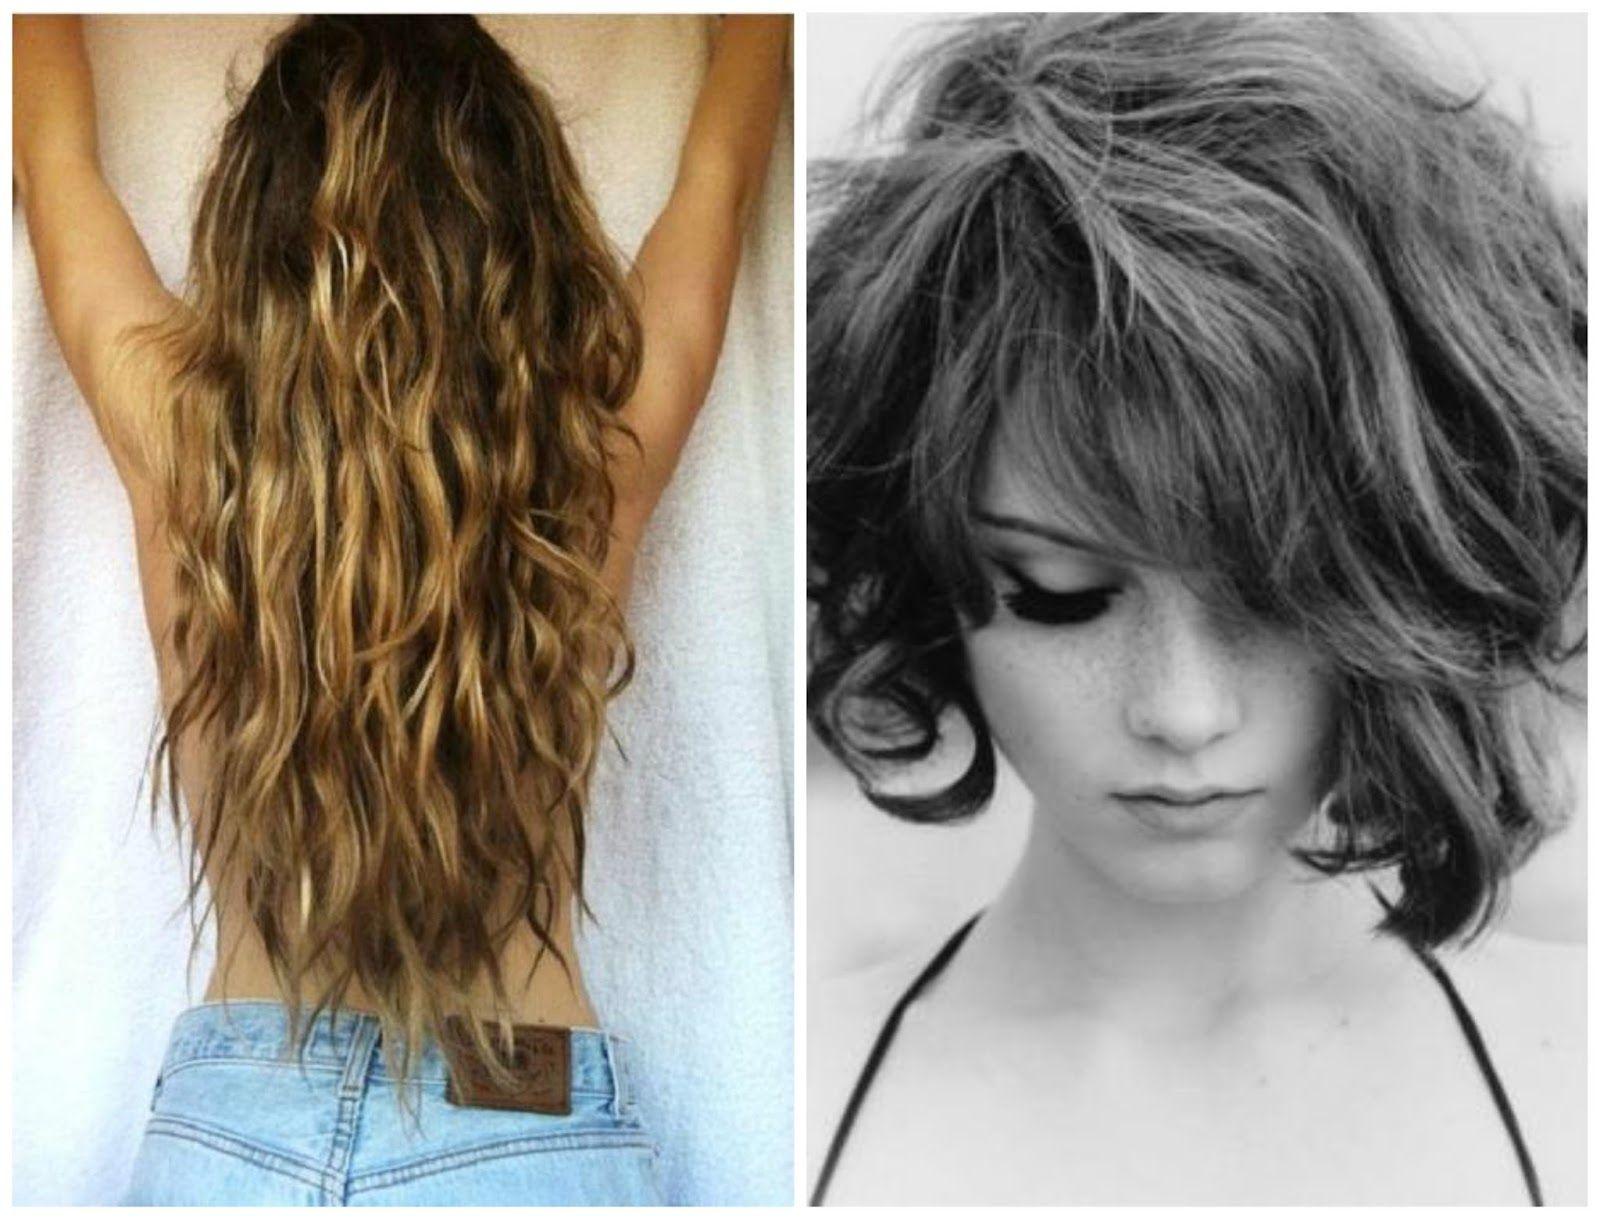 Petite in pink get inspired hair styles how to ubeachyu waves